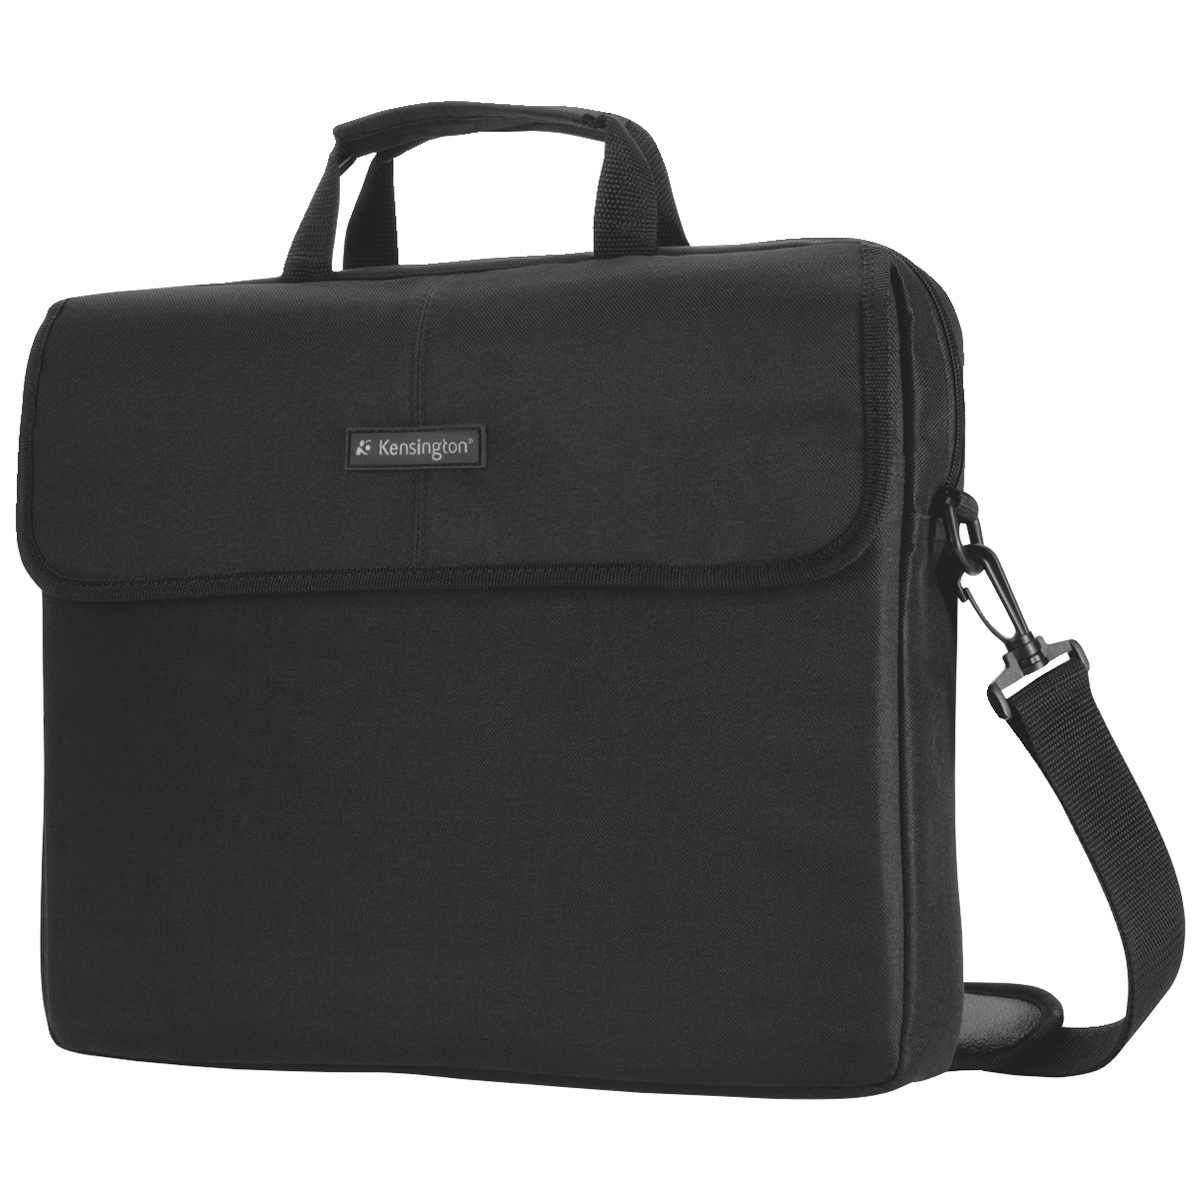 Kensington K62562EU Simply Portable Classic Sleeve 16.6 Inch